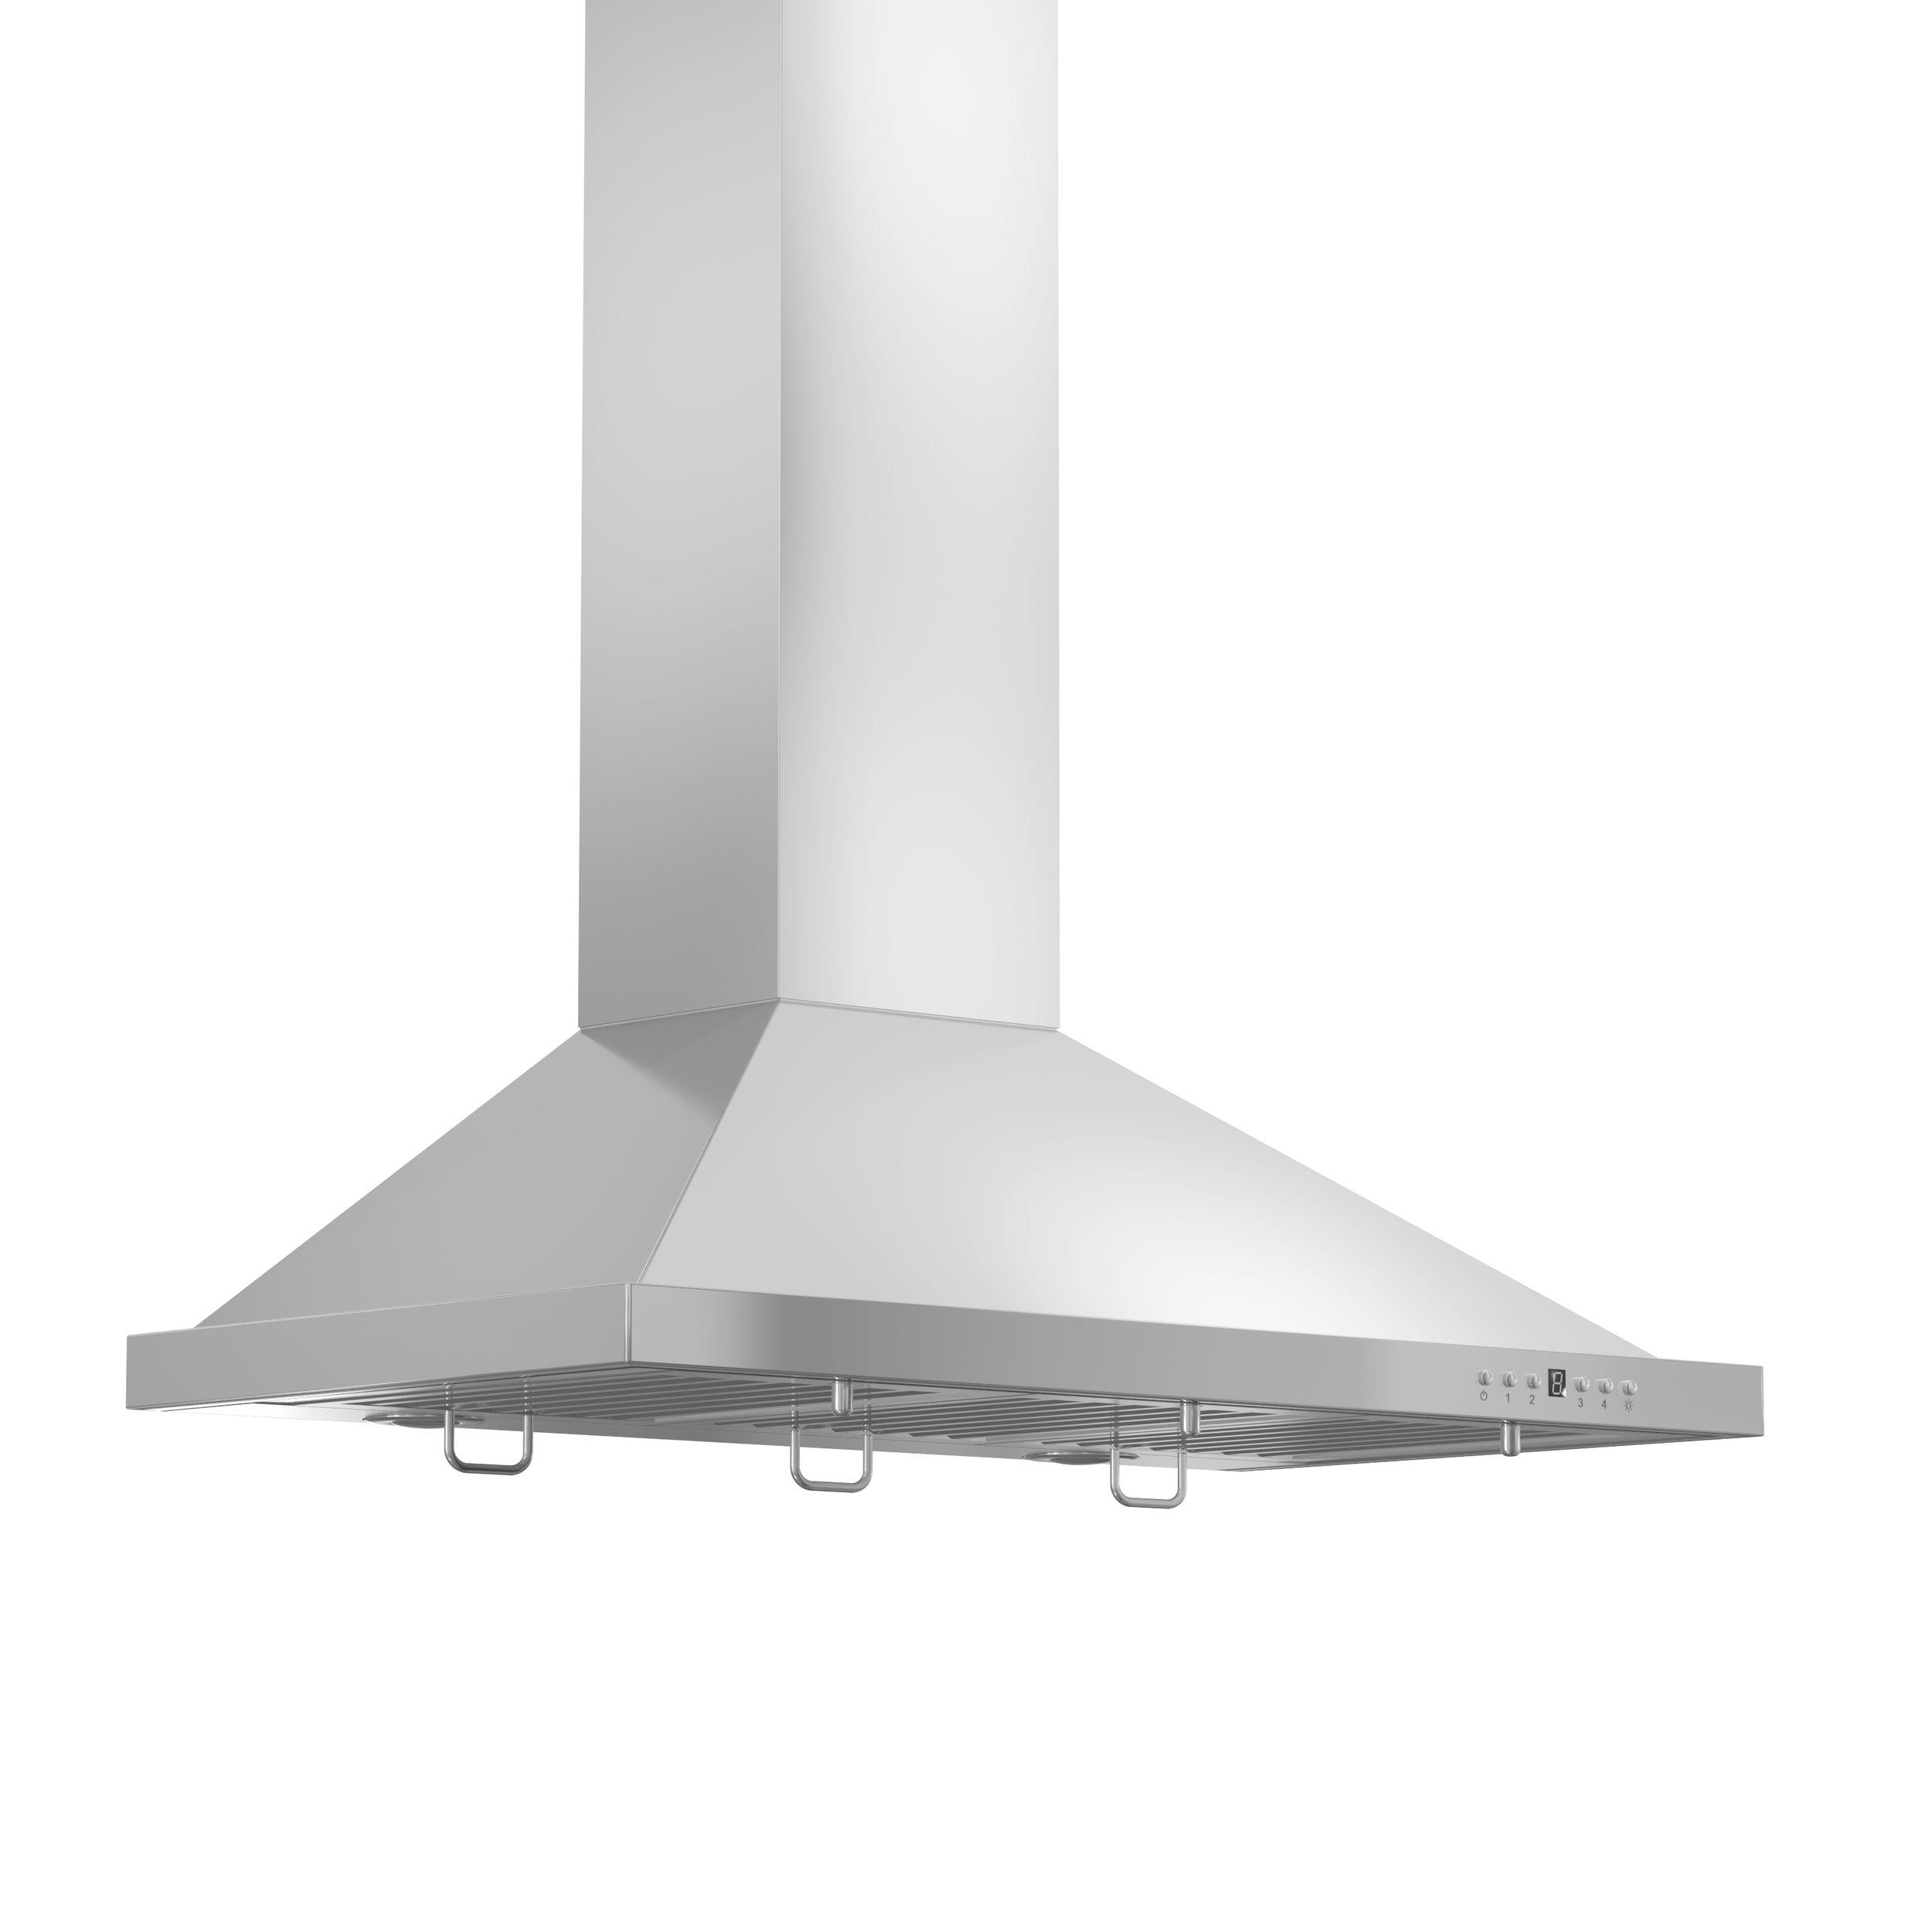 outdoor kitchen hood chinese accessories range hoods zline stainless steel wall kb 304